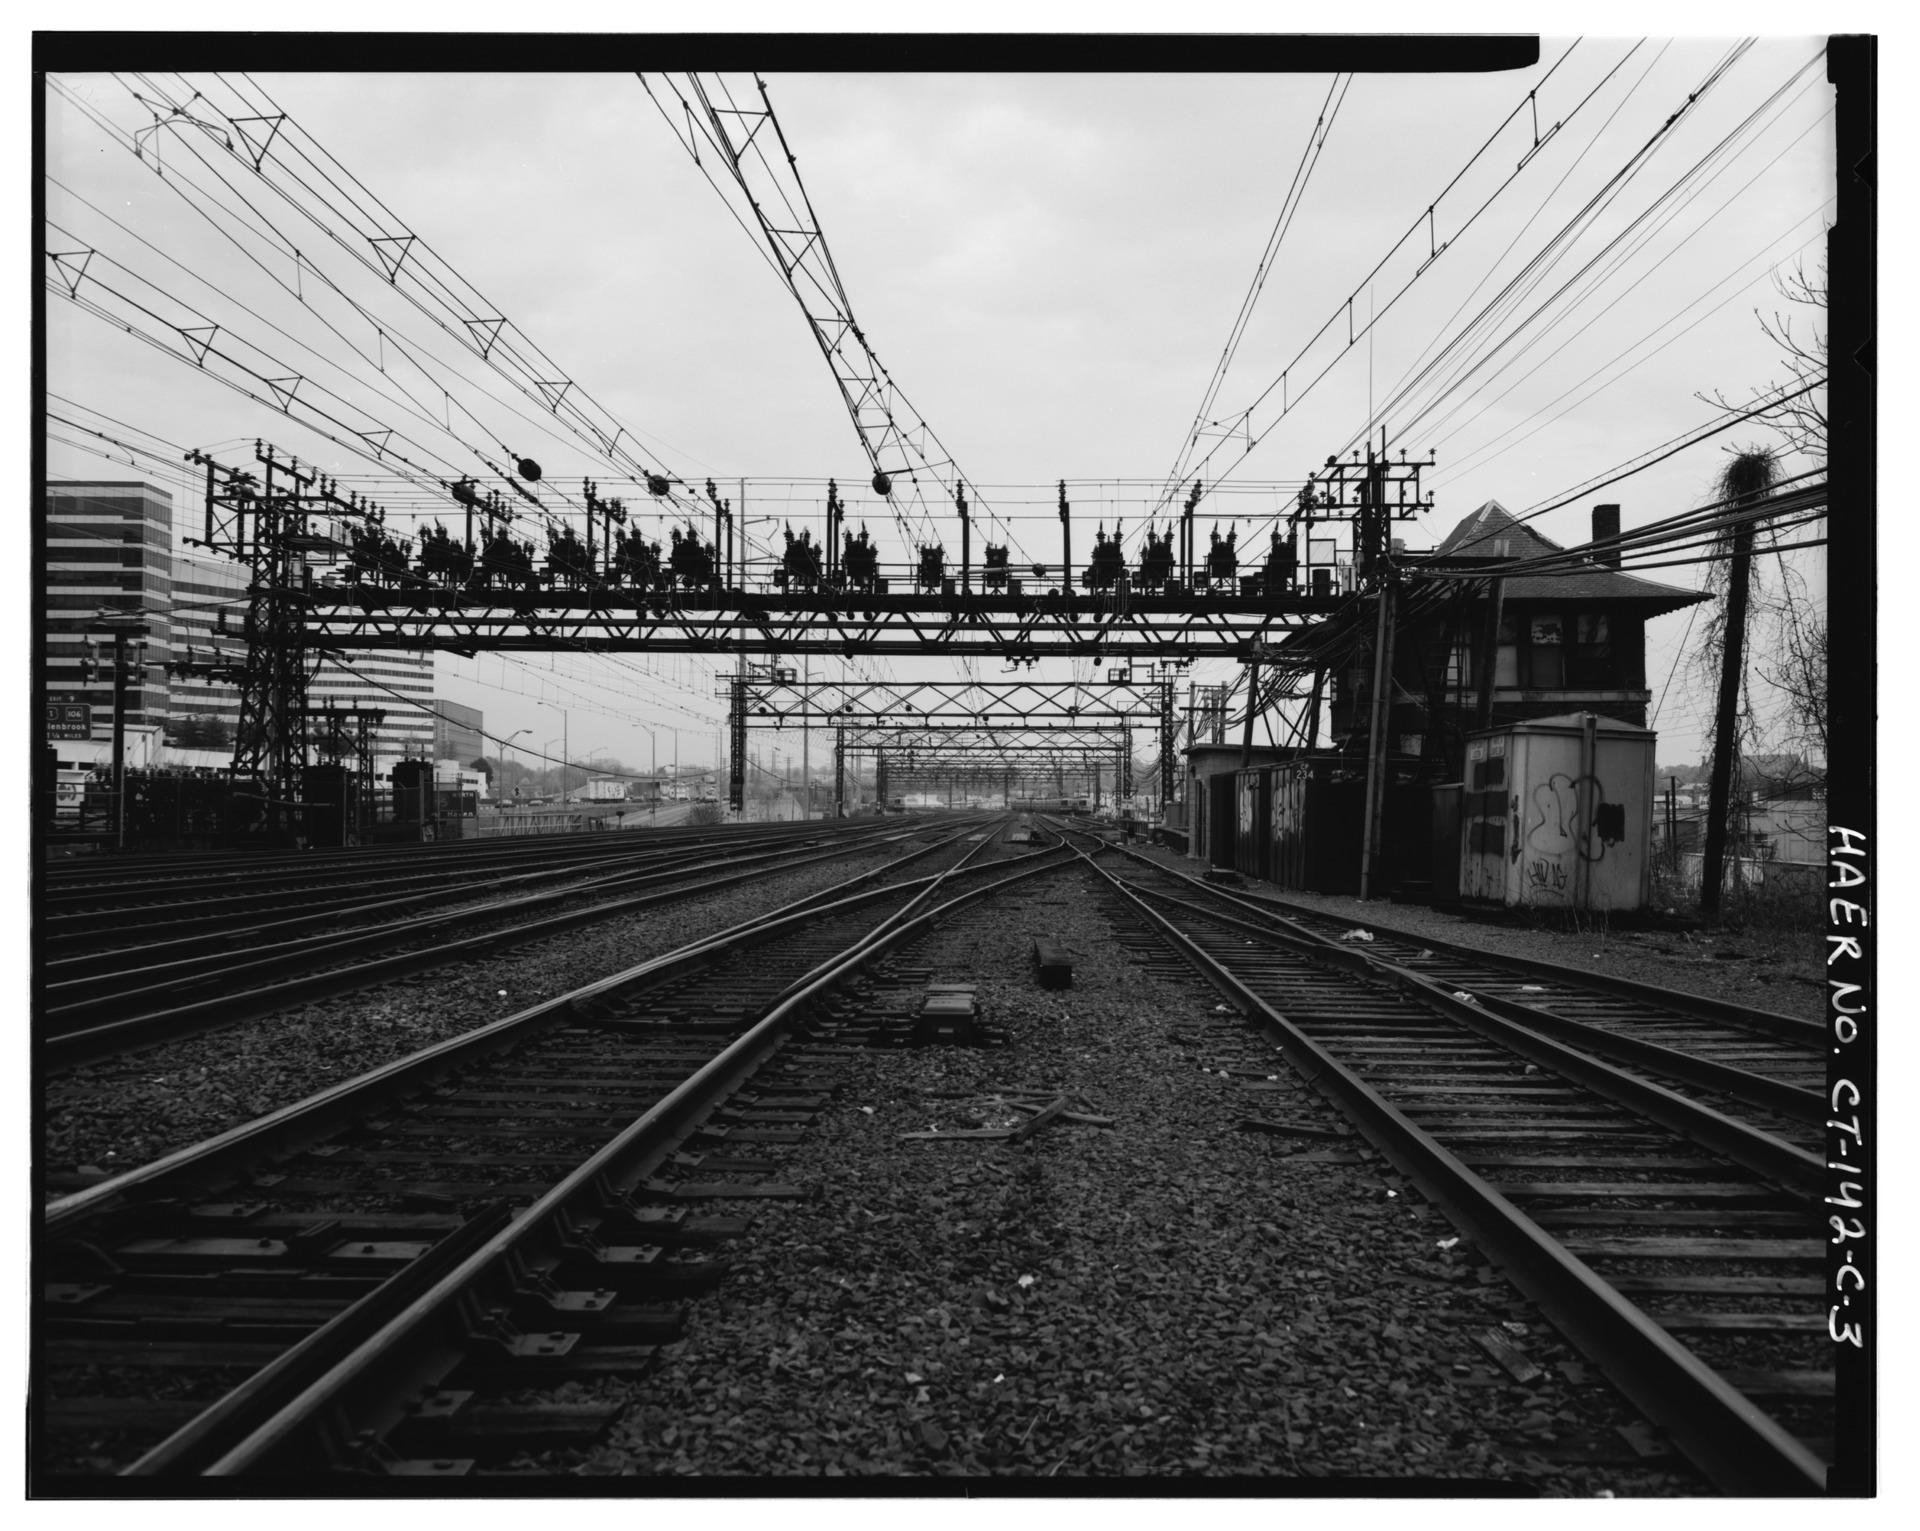 VIEW_EAST_TOWARD_STAMFORD_ANCHOR_BRIDGE_-374_OF_CIRCUIT_BREAKER_INSTALLATION_ON_CROSS_BEAM_OF_BRIDGE._-_New_York,_New_Haven_and_Hartford_Railroad,_Bridge-Type_Circuit_Breakers,_HAER_CONN,1.jpg